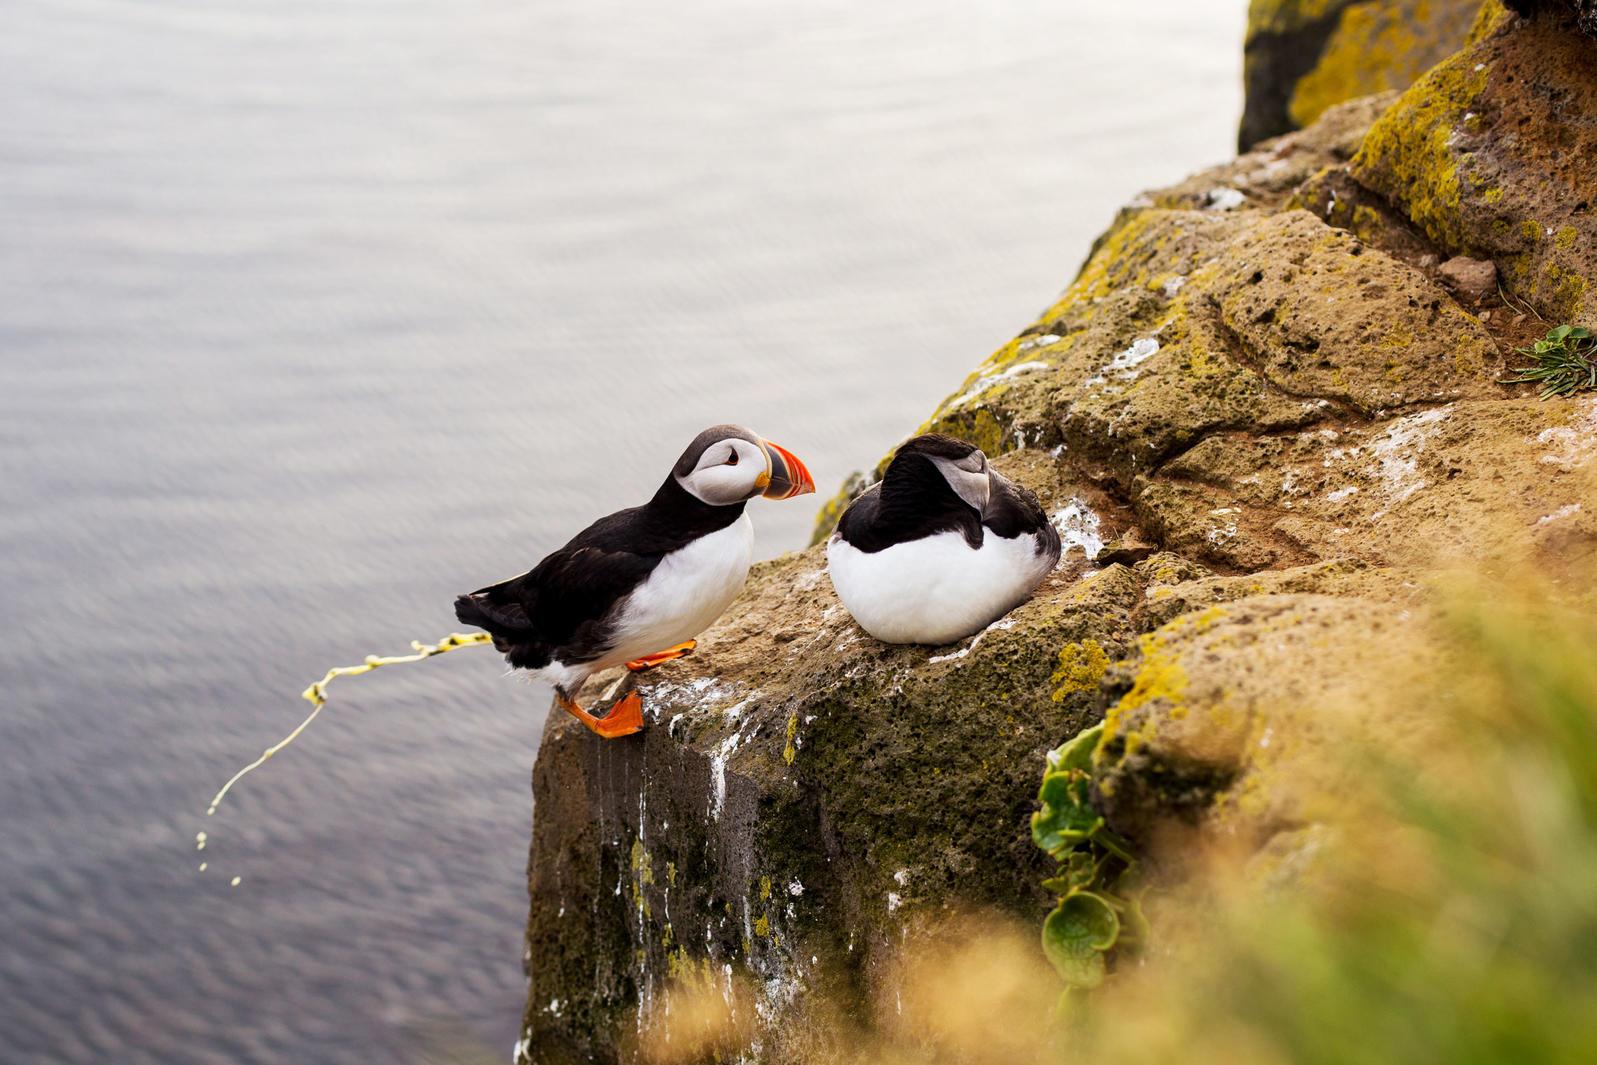 An Atlantic Puffin doing its part. Ale Koziura/Shutterstock